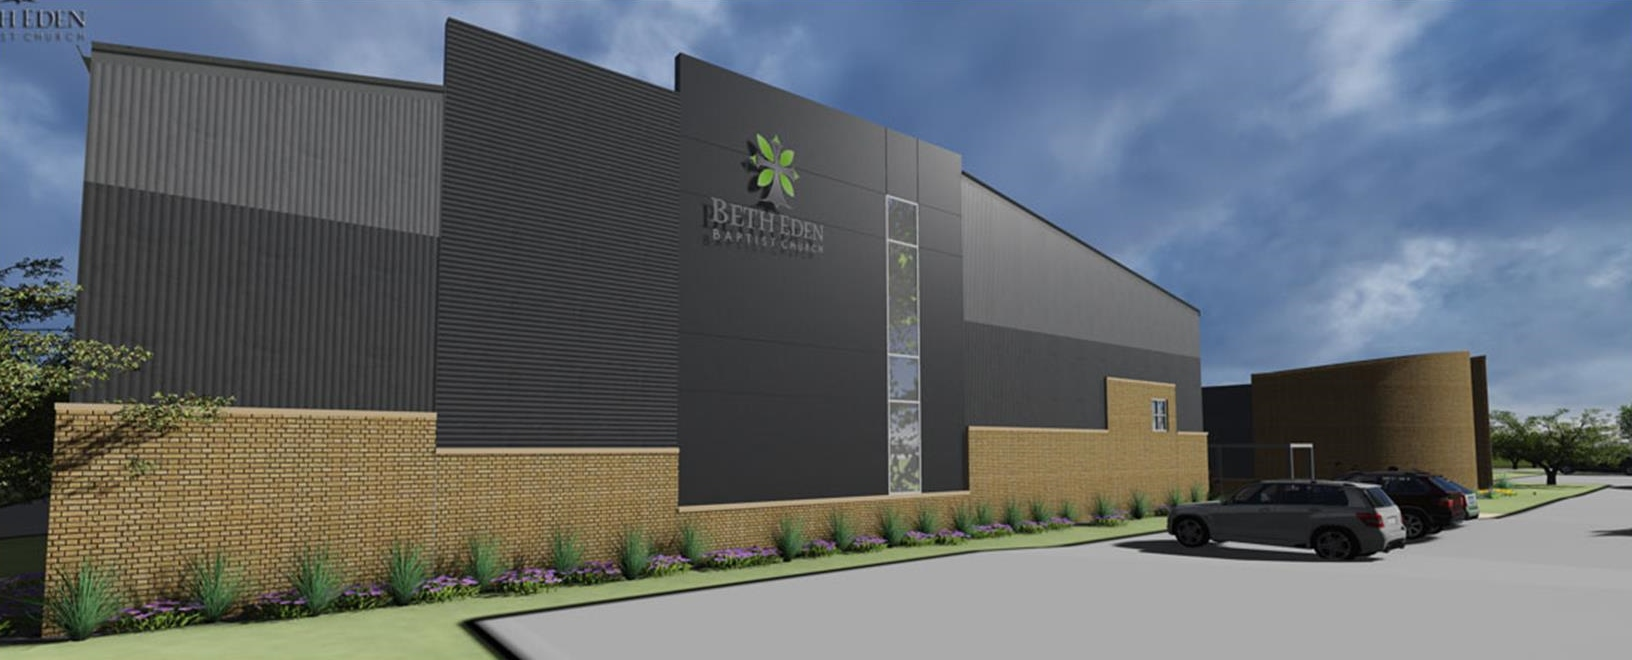 Rendering of new gymnasium